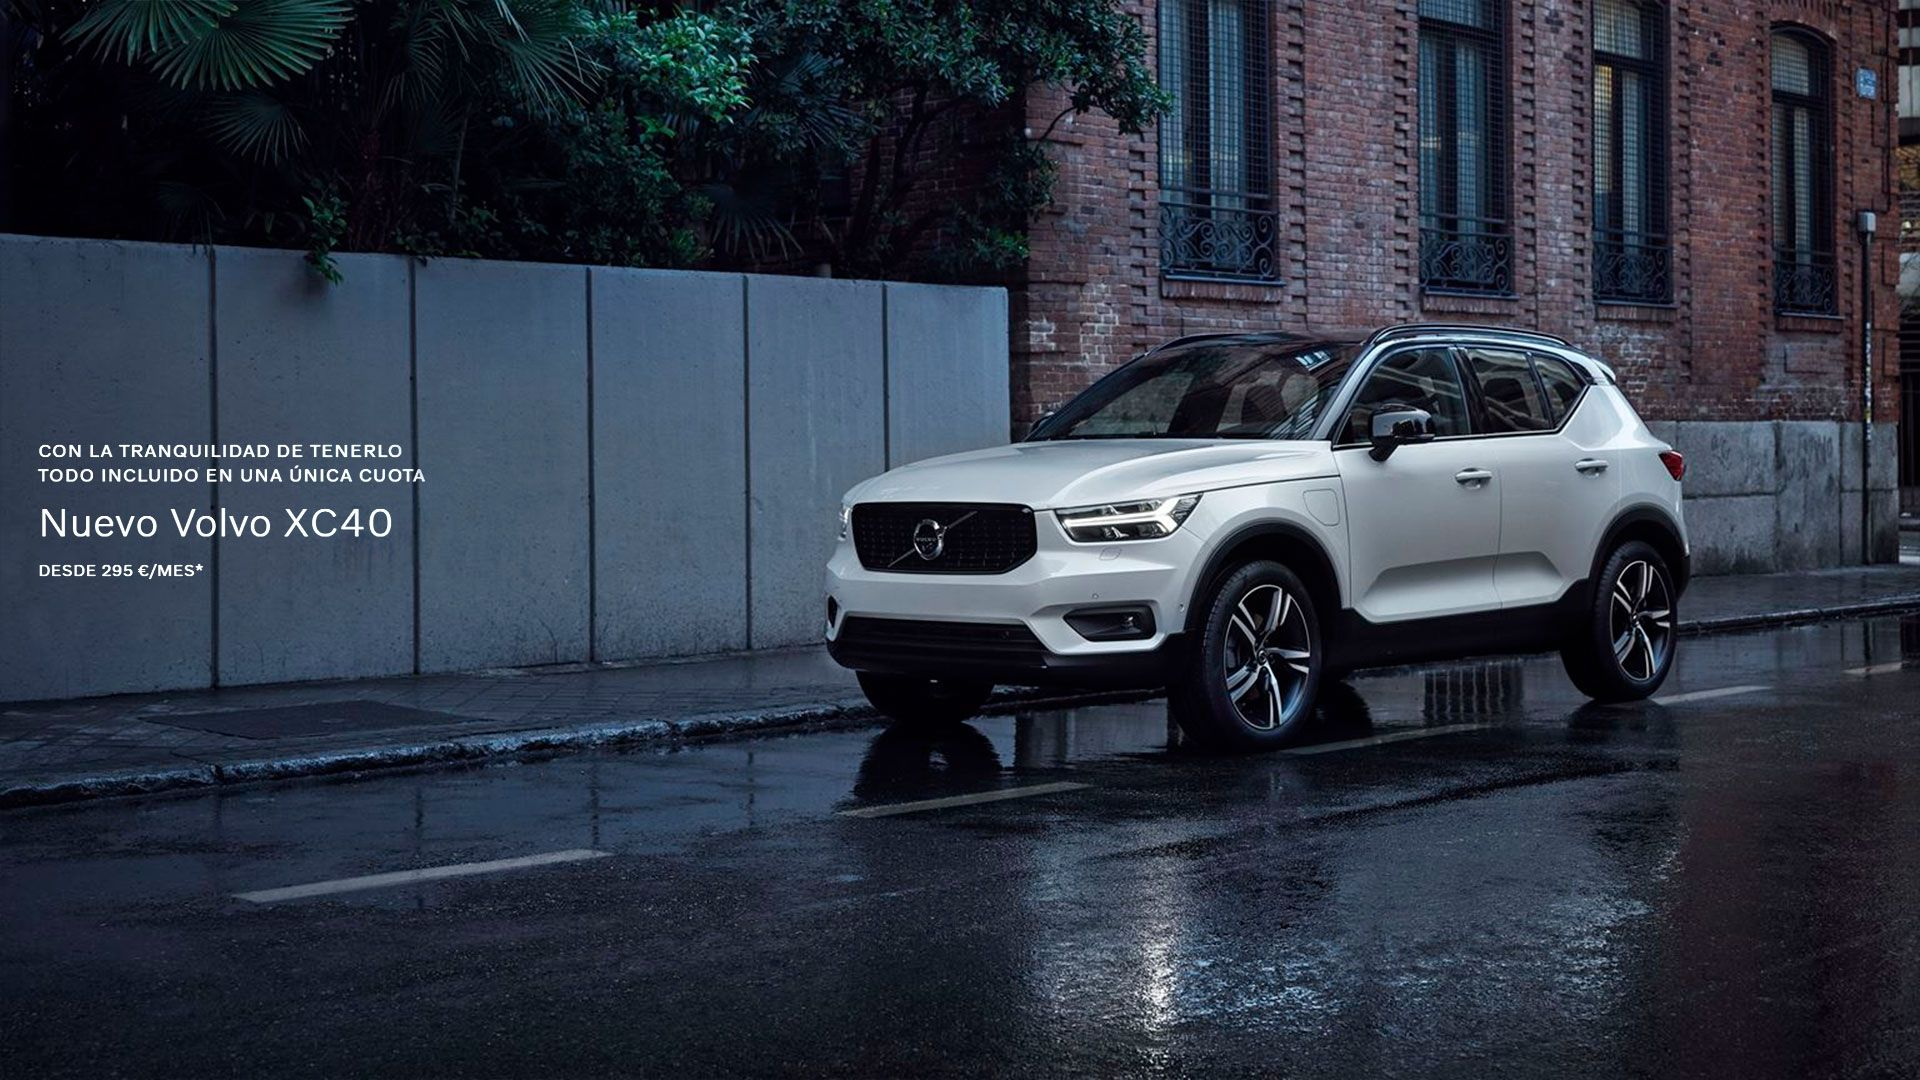 Nuevo Volvo XC40